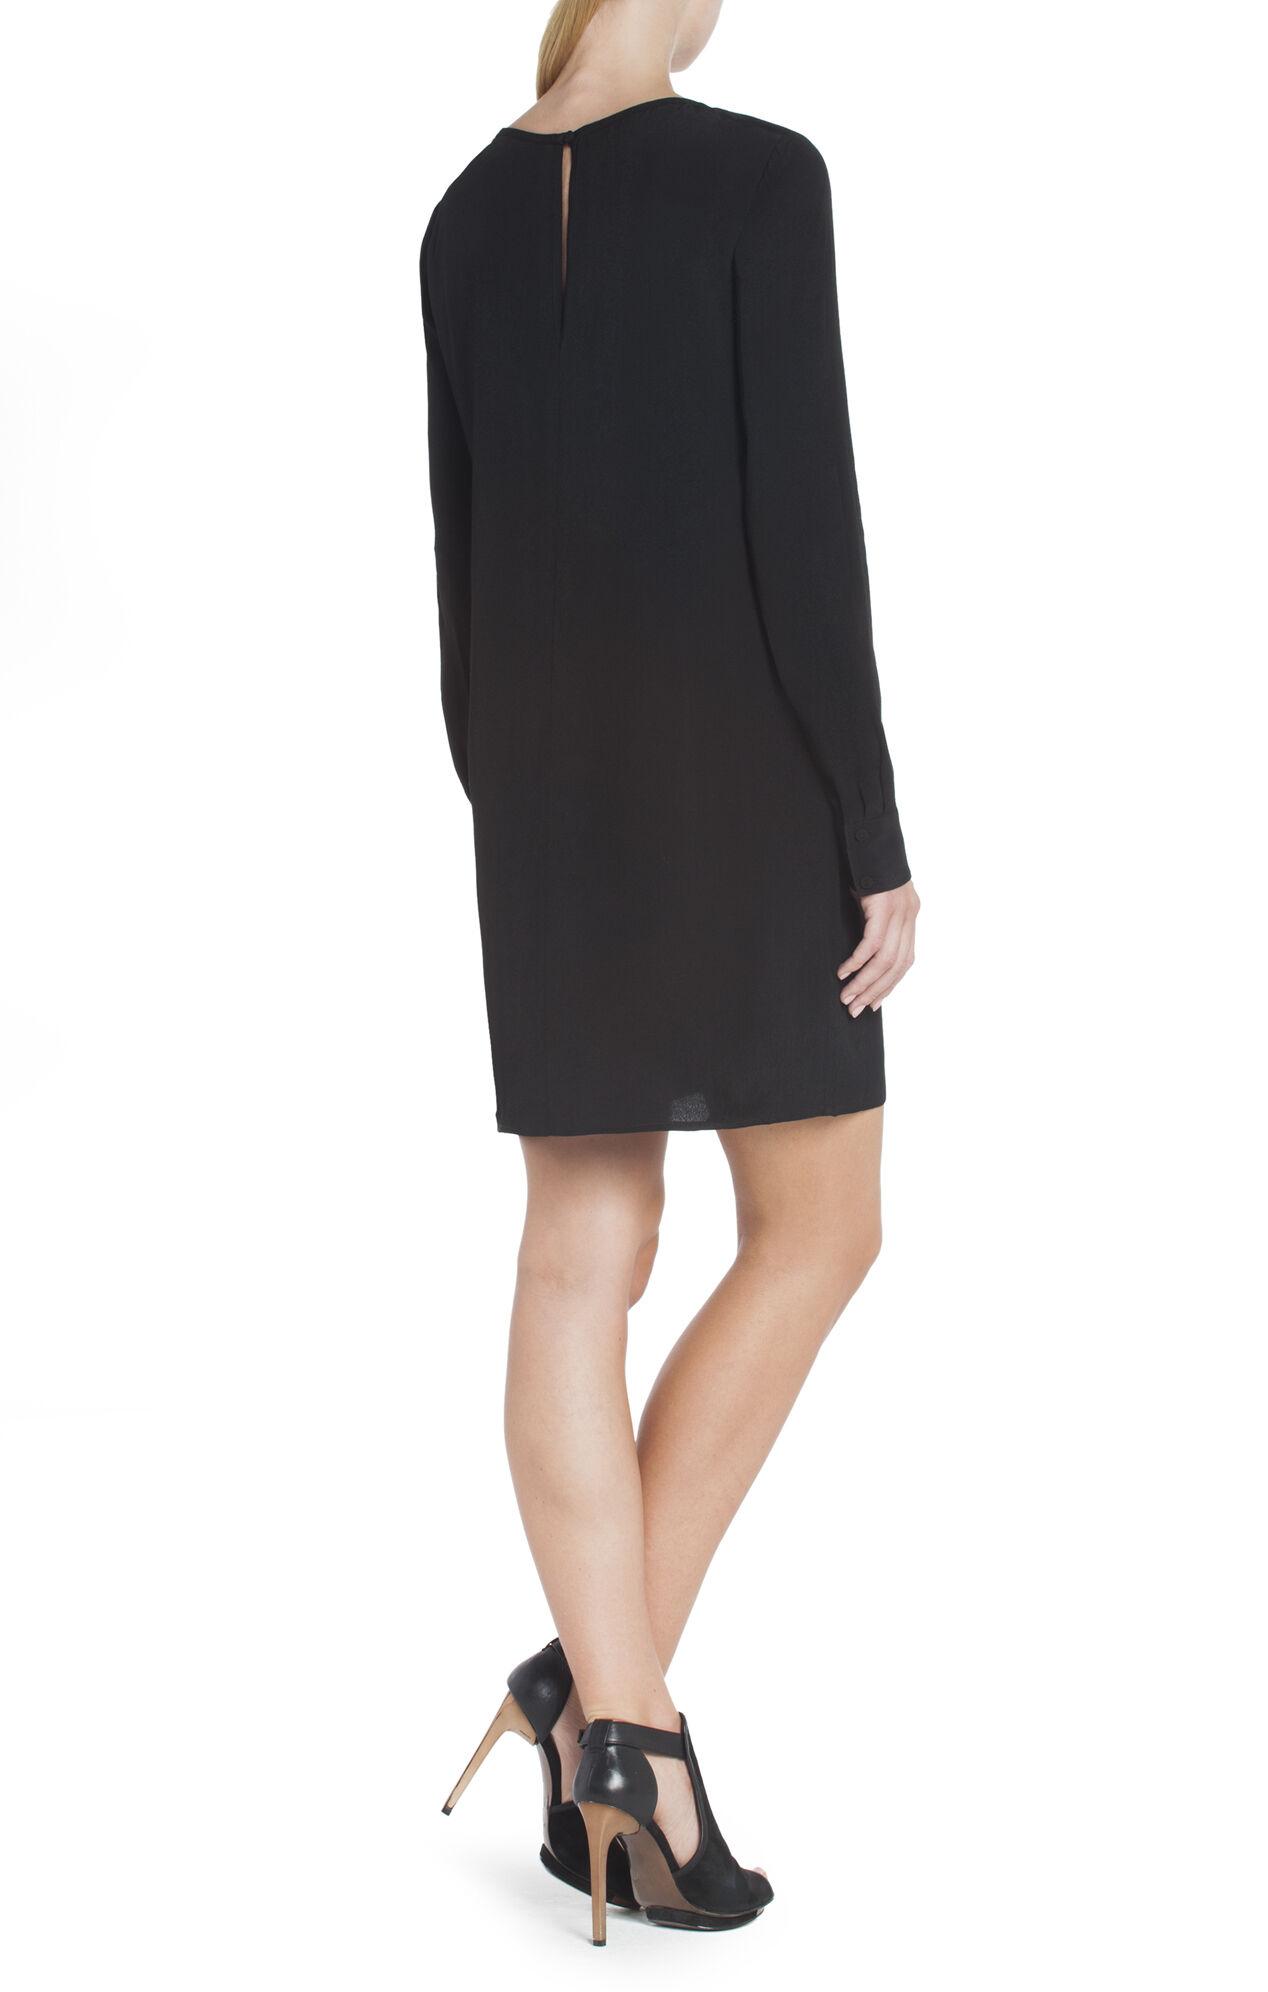 Emmalise Dress